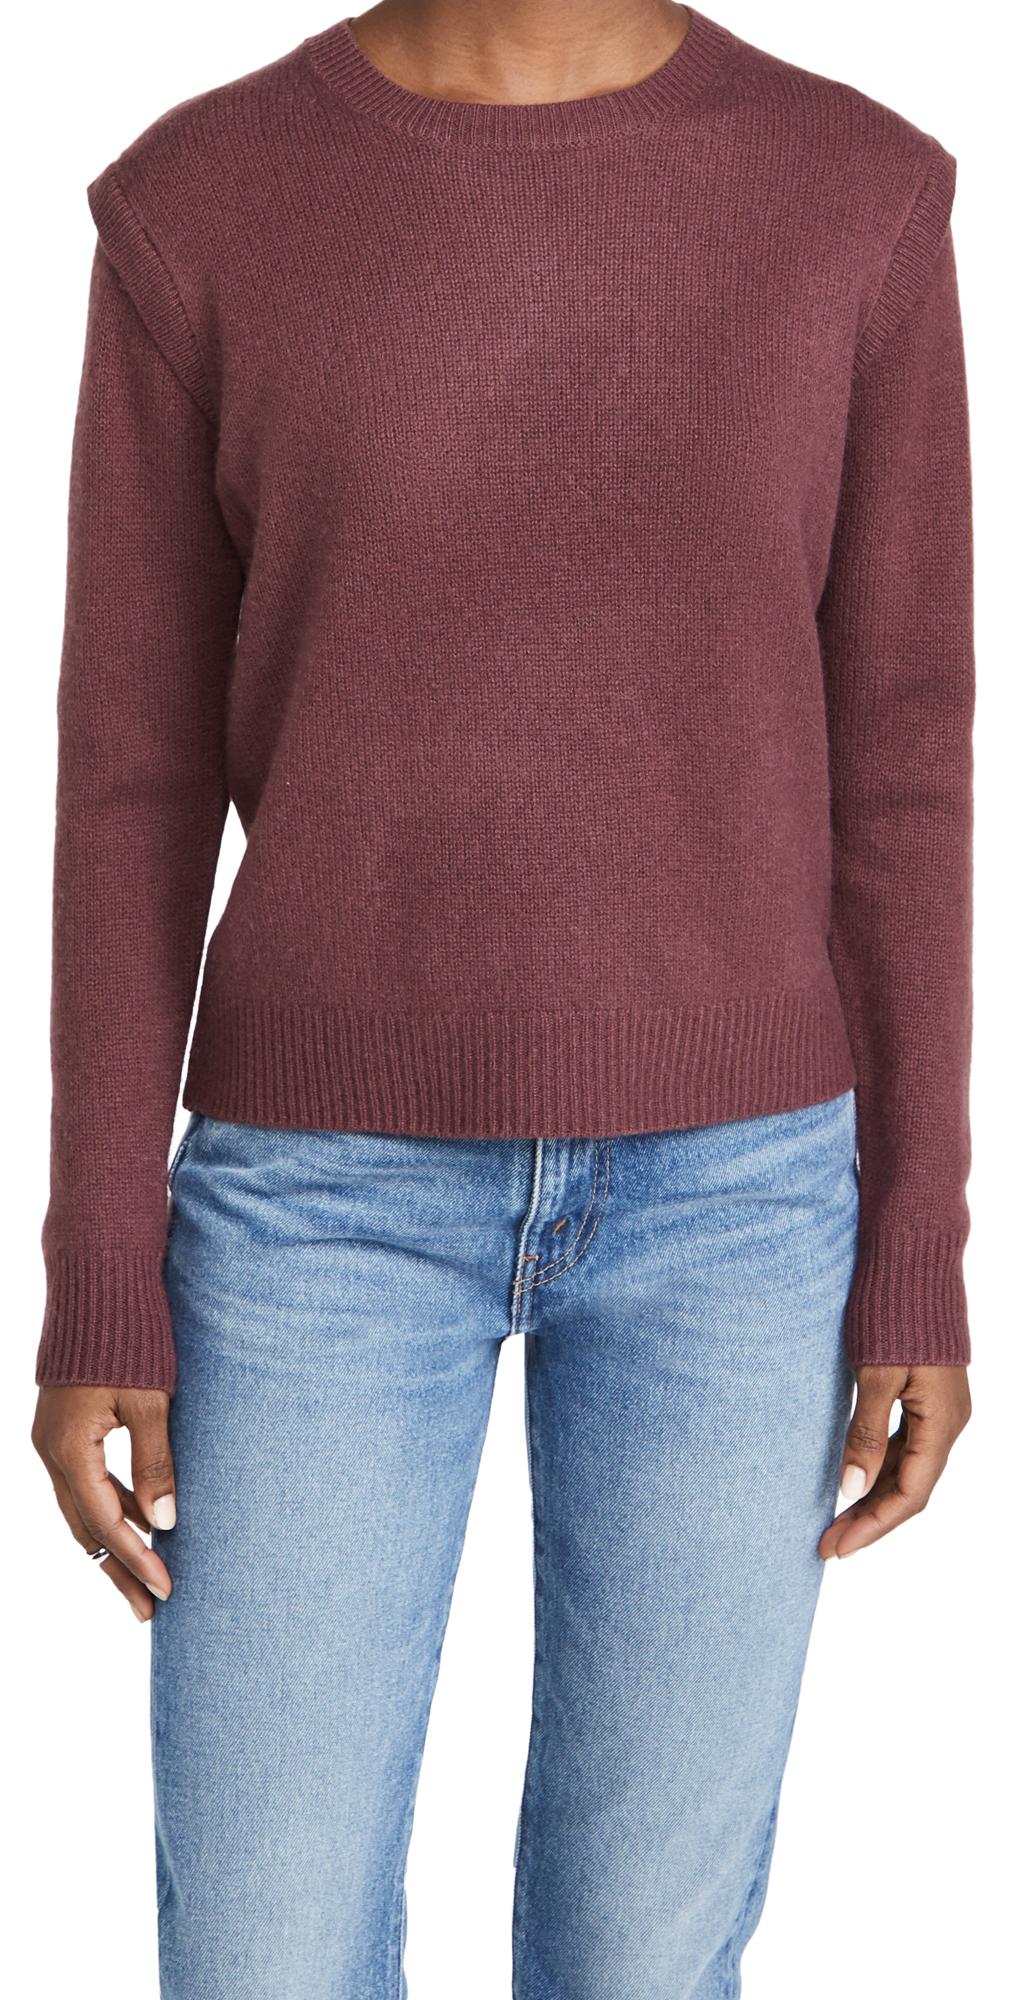 360 SWEATER Mila Cashmere Sweater